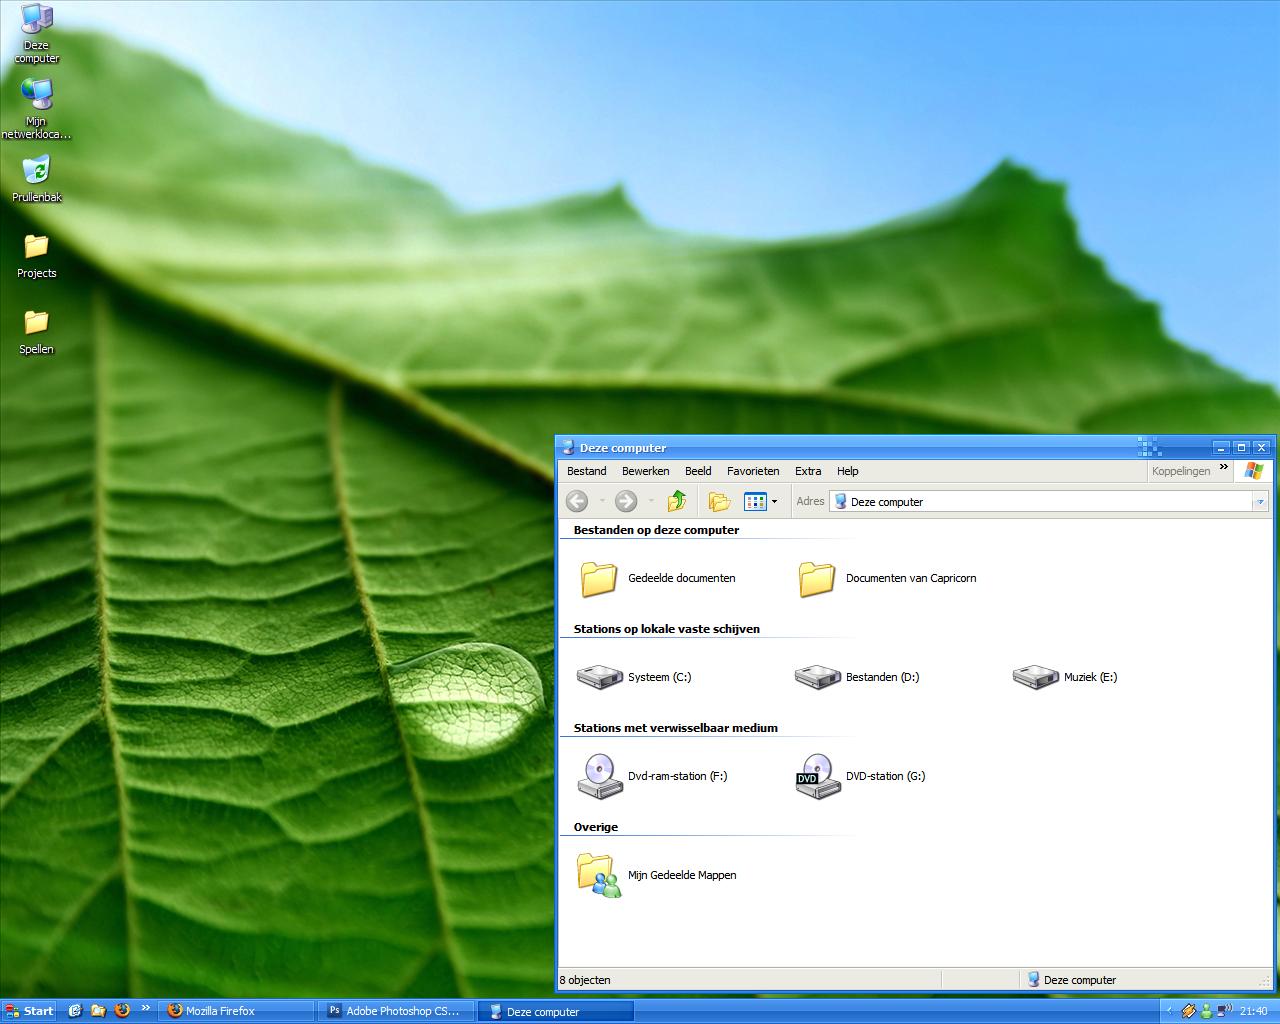 Desktop: 02-06-08